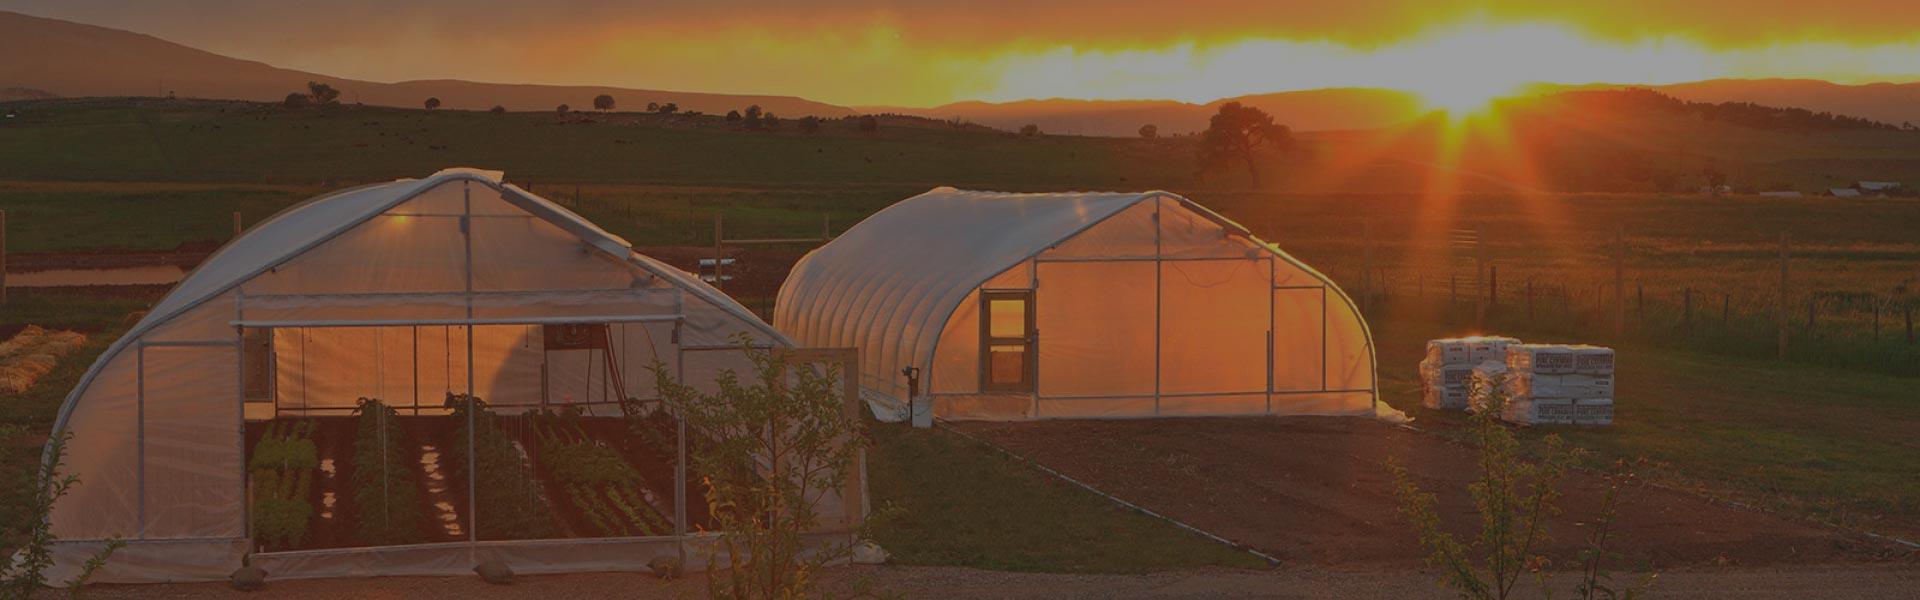 Rimol Greenhouses